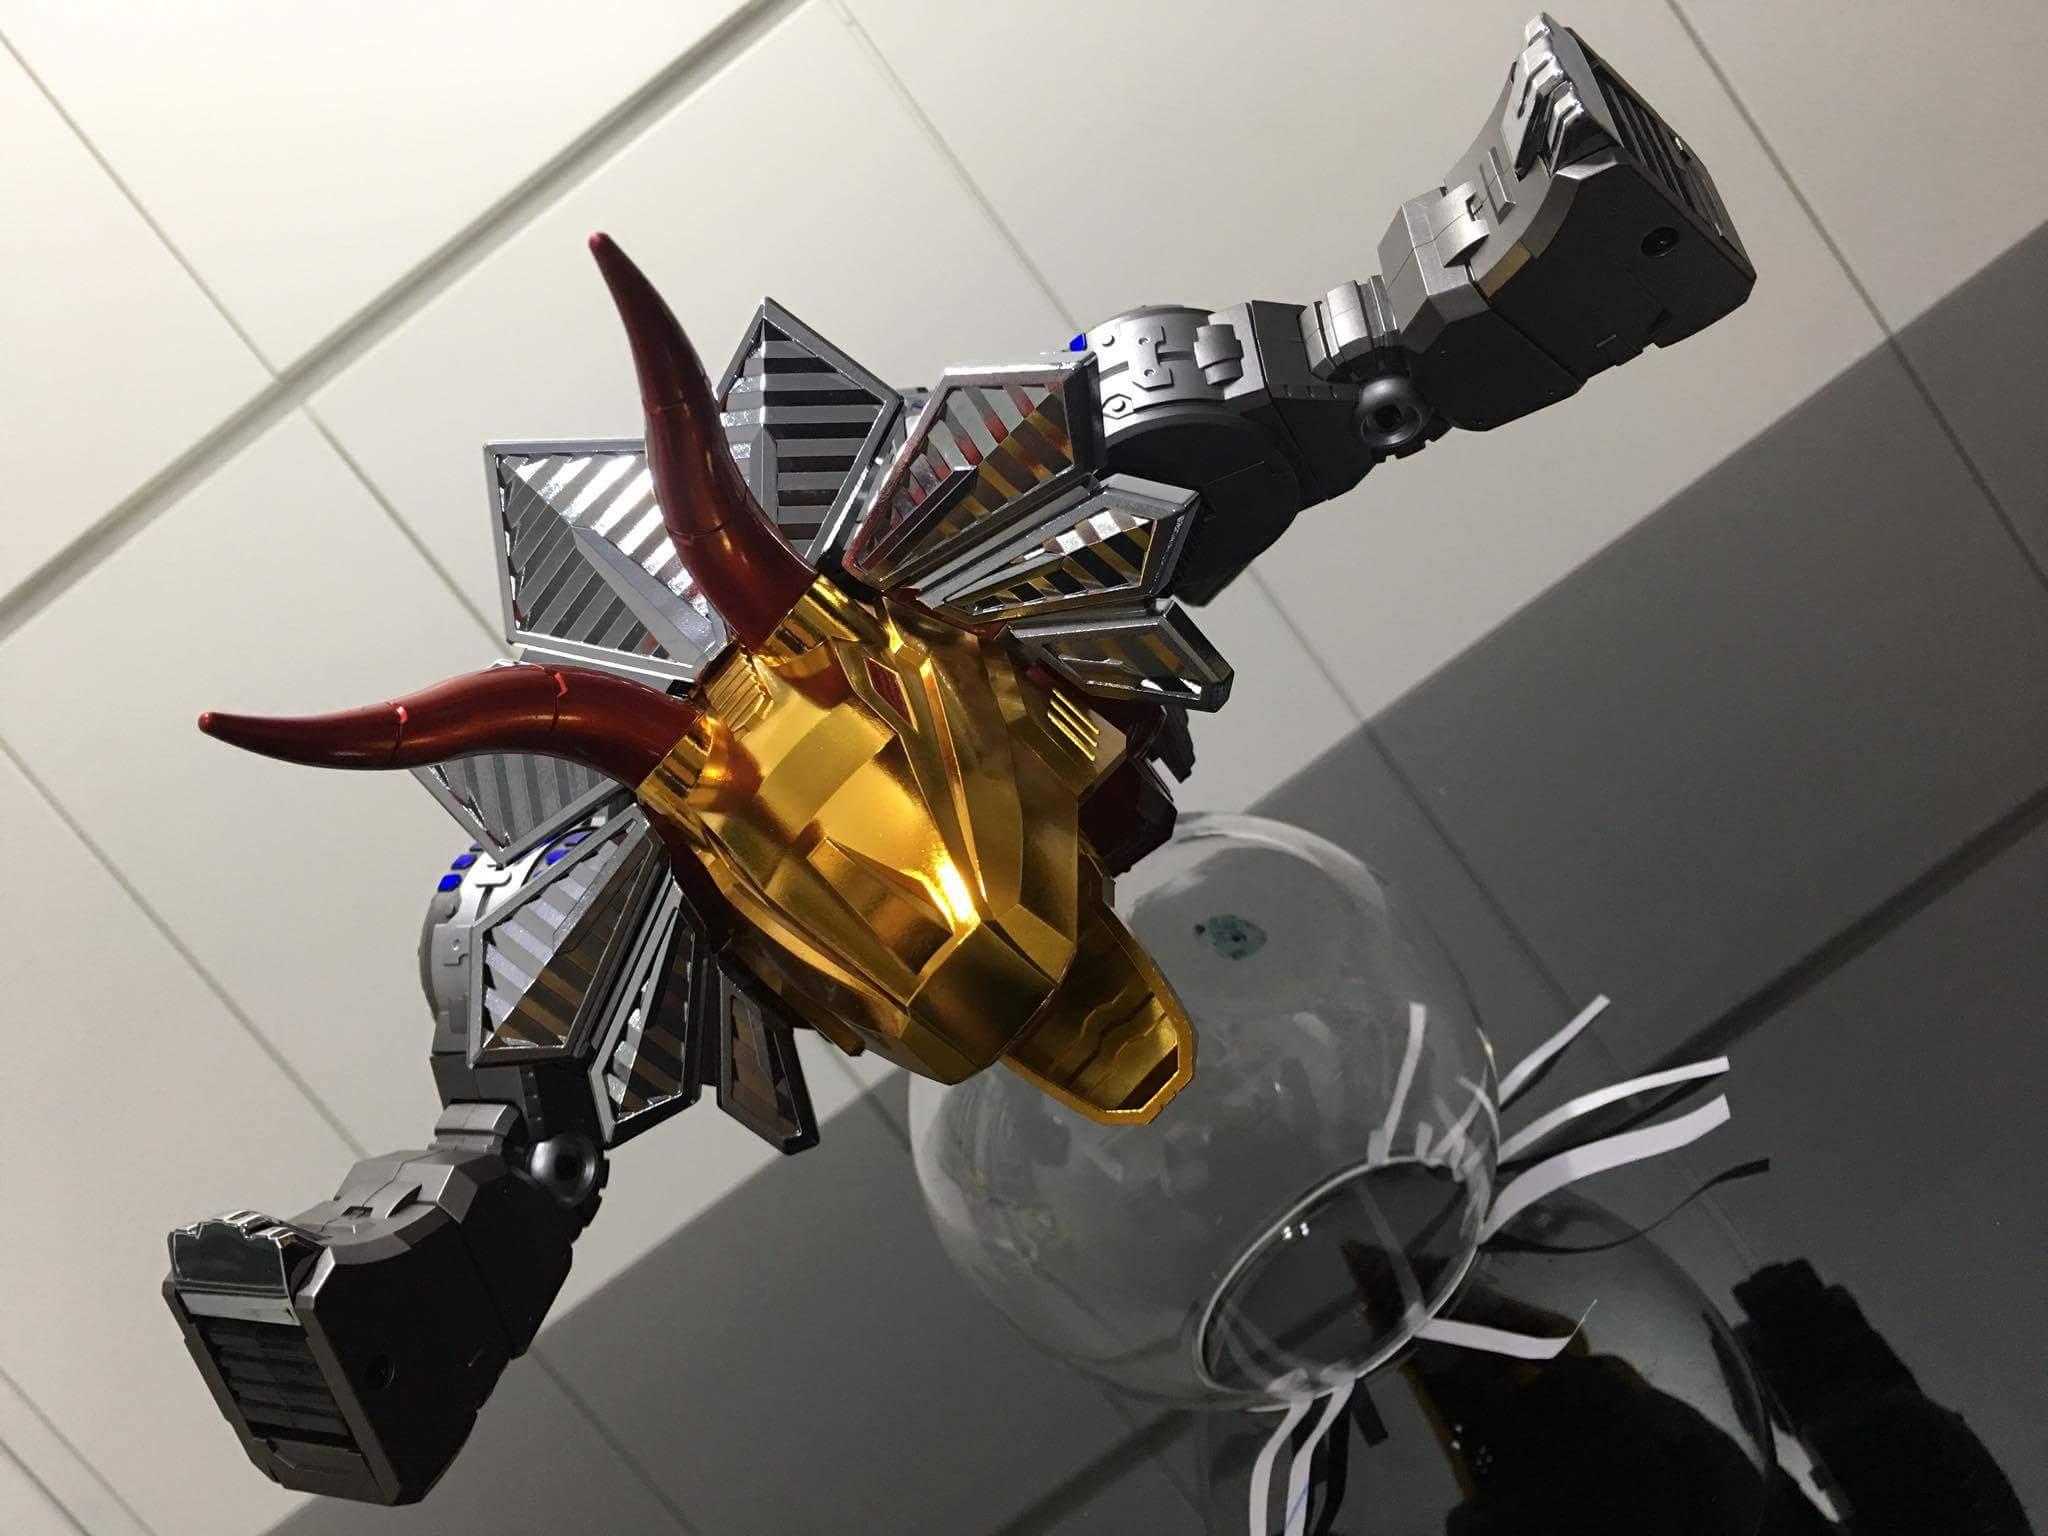 [GigaPower] Produit Tiers - Jouets HQ-01 Superator + HQ-02 Grassor + HQ-03 Guttur + HQ-04 Graviter + HQ-05 Gaudenter - aka Dinobots - Page 4 AsZrIWC8